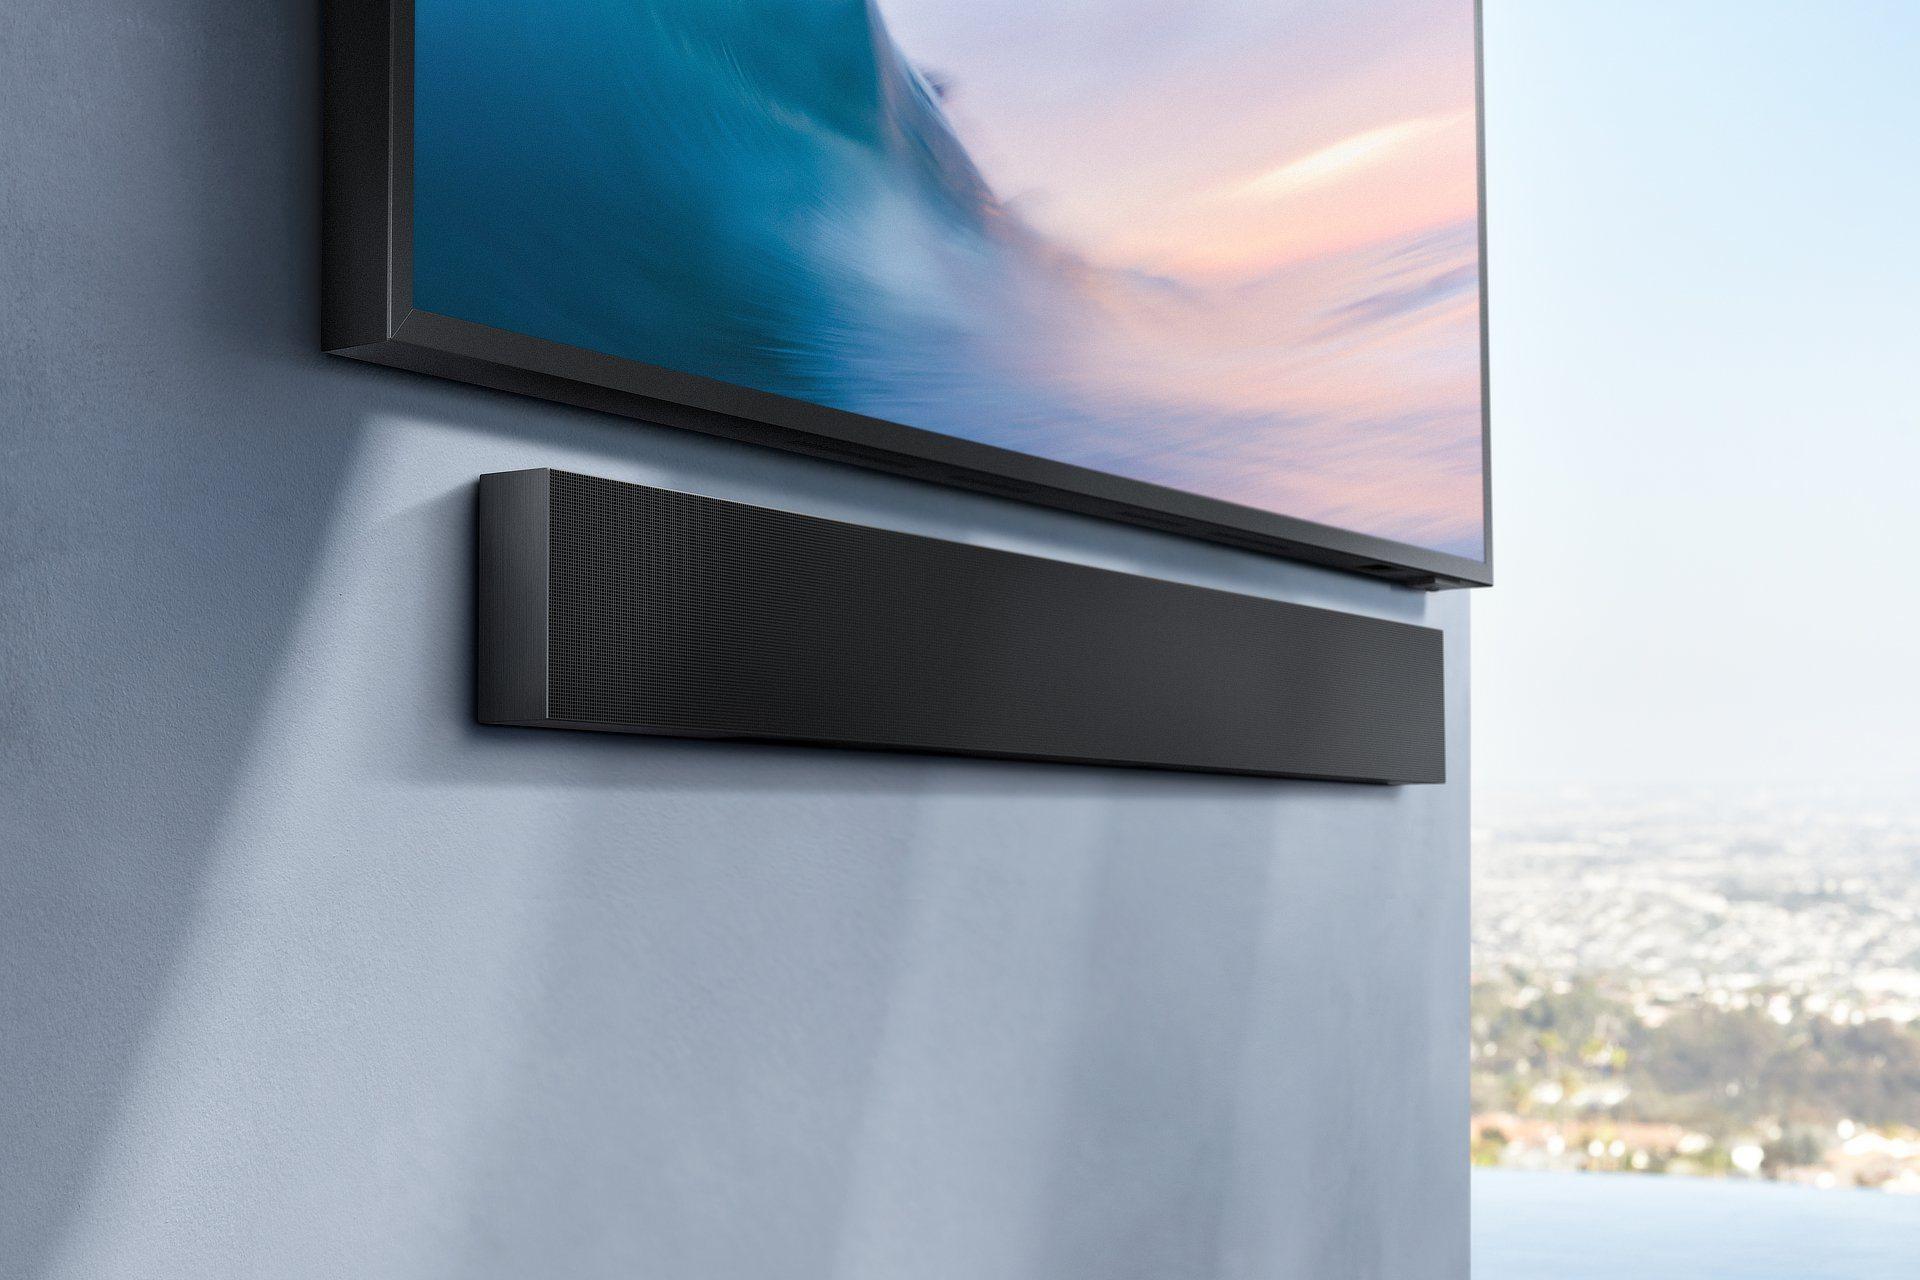 Terrace: Samsung's first outdoor 4K QLED TV